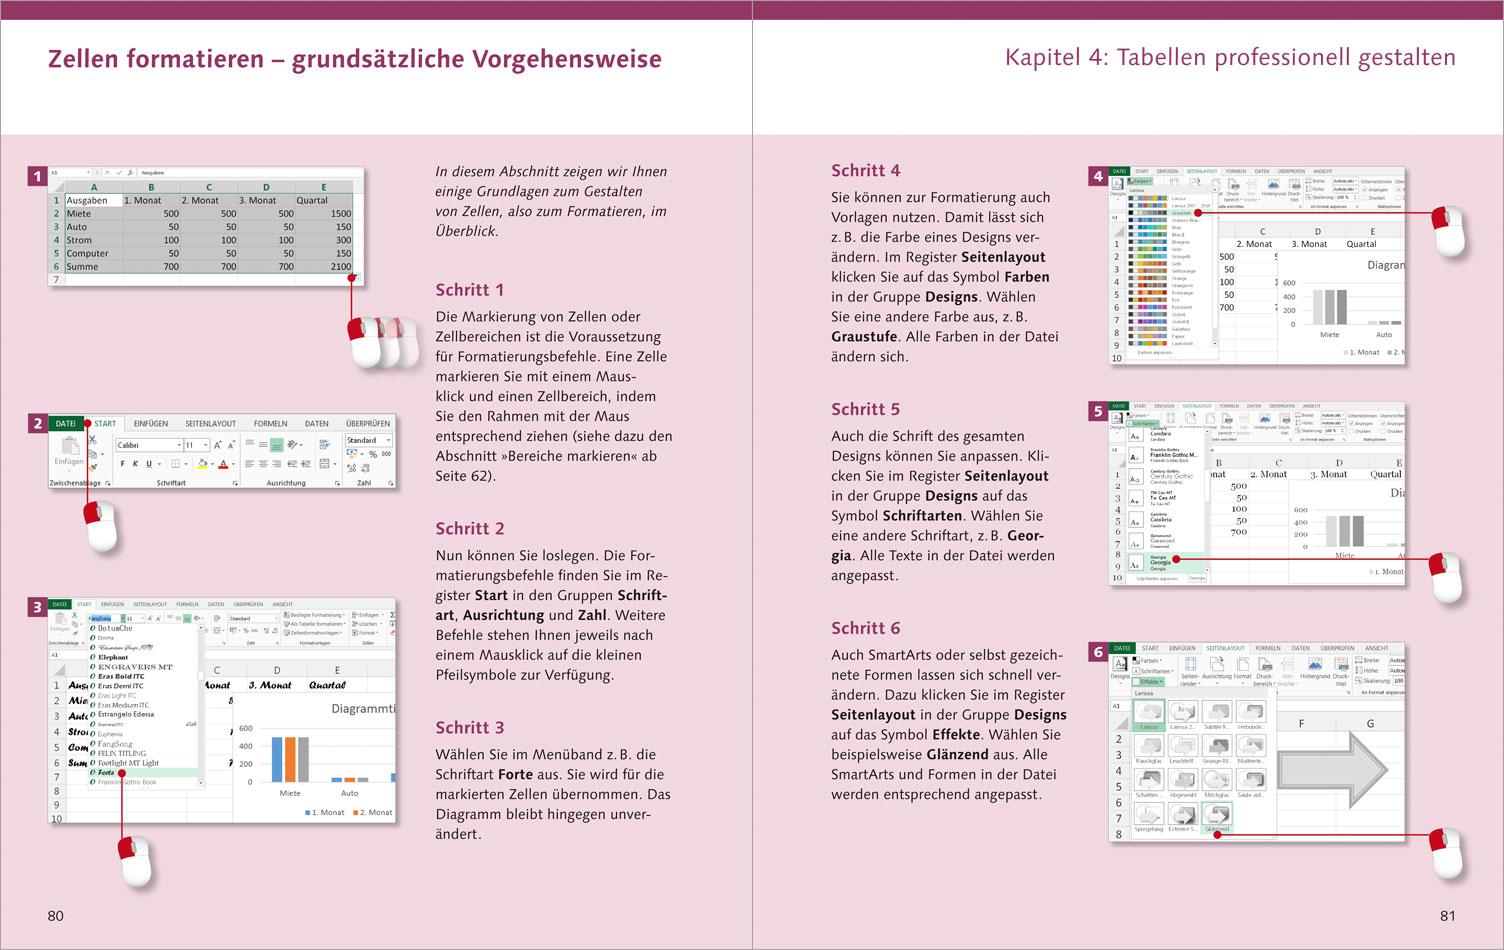 Großartig Farbe Nach Anzahl Algebra Arbeitsblatt Galerie - Mathe ...